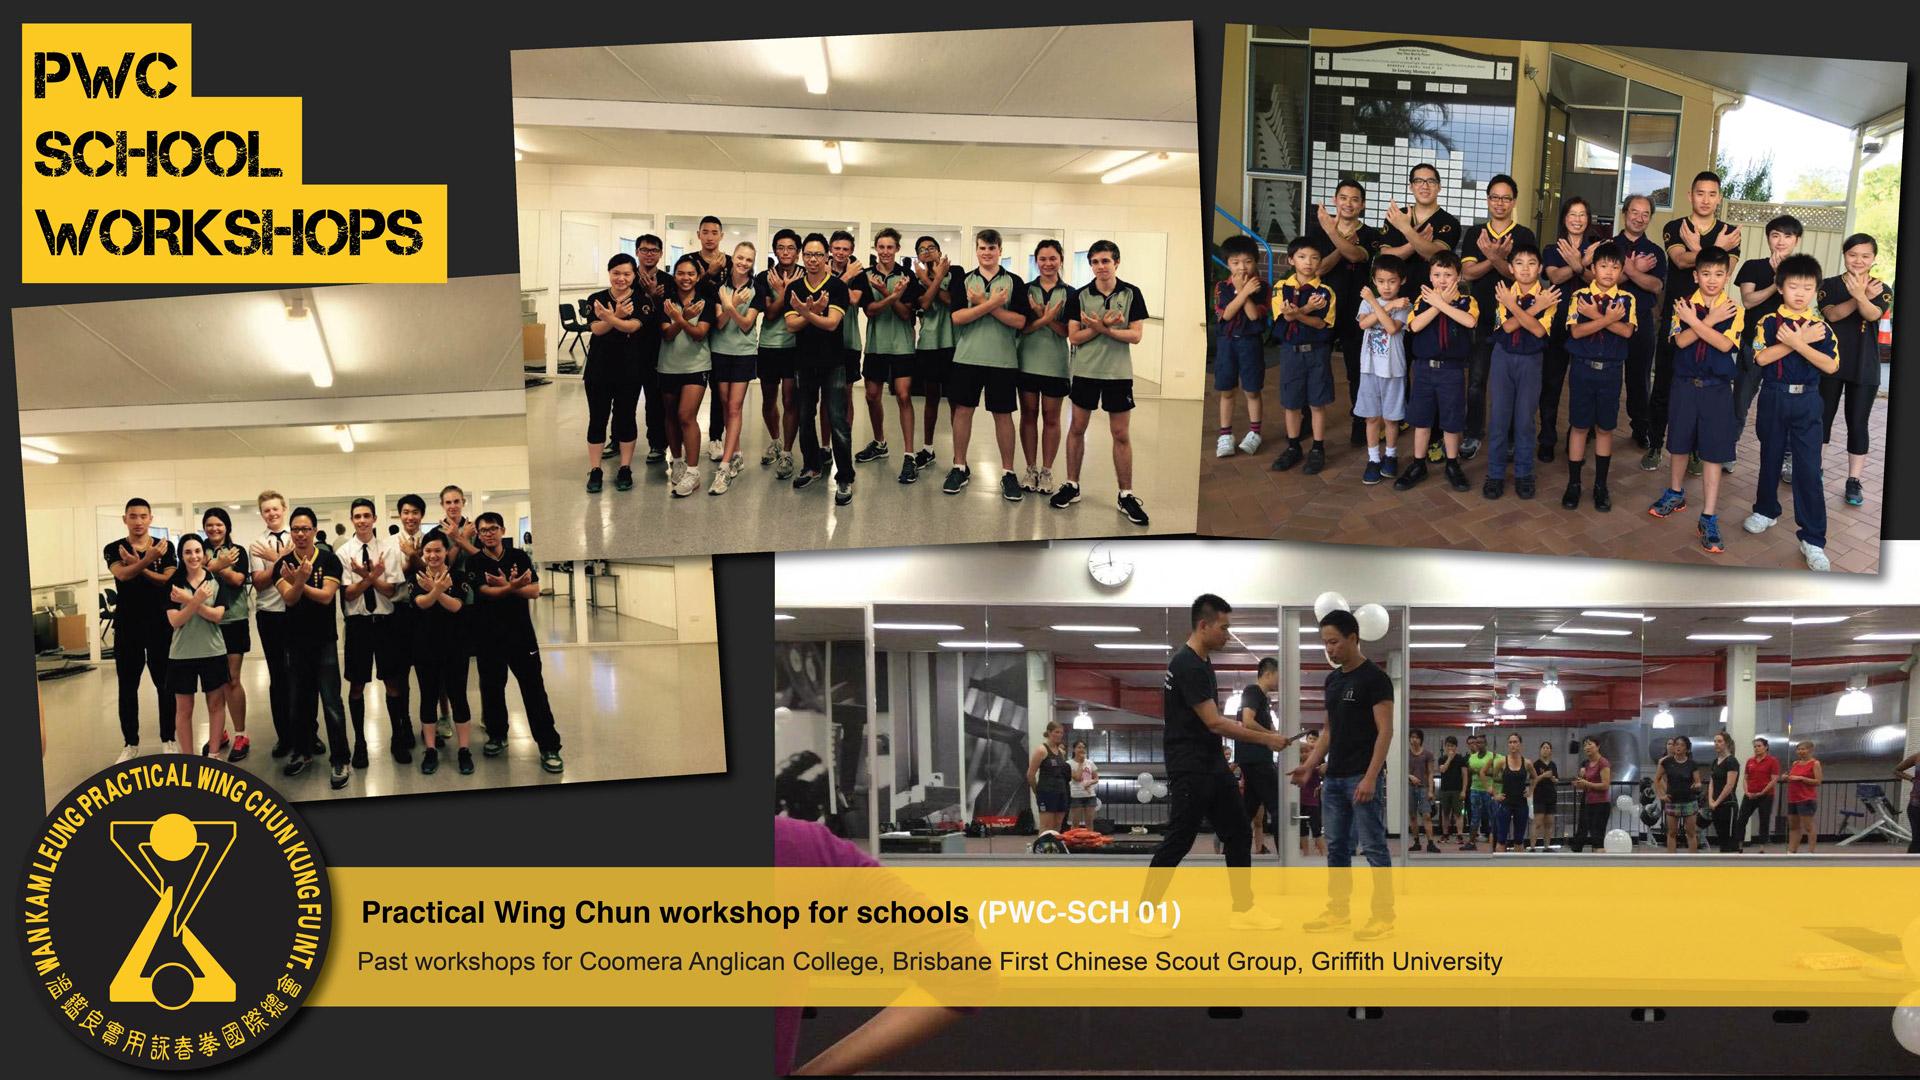 school-workshops-PWC